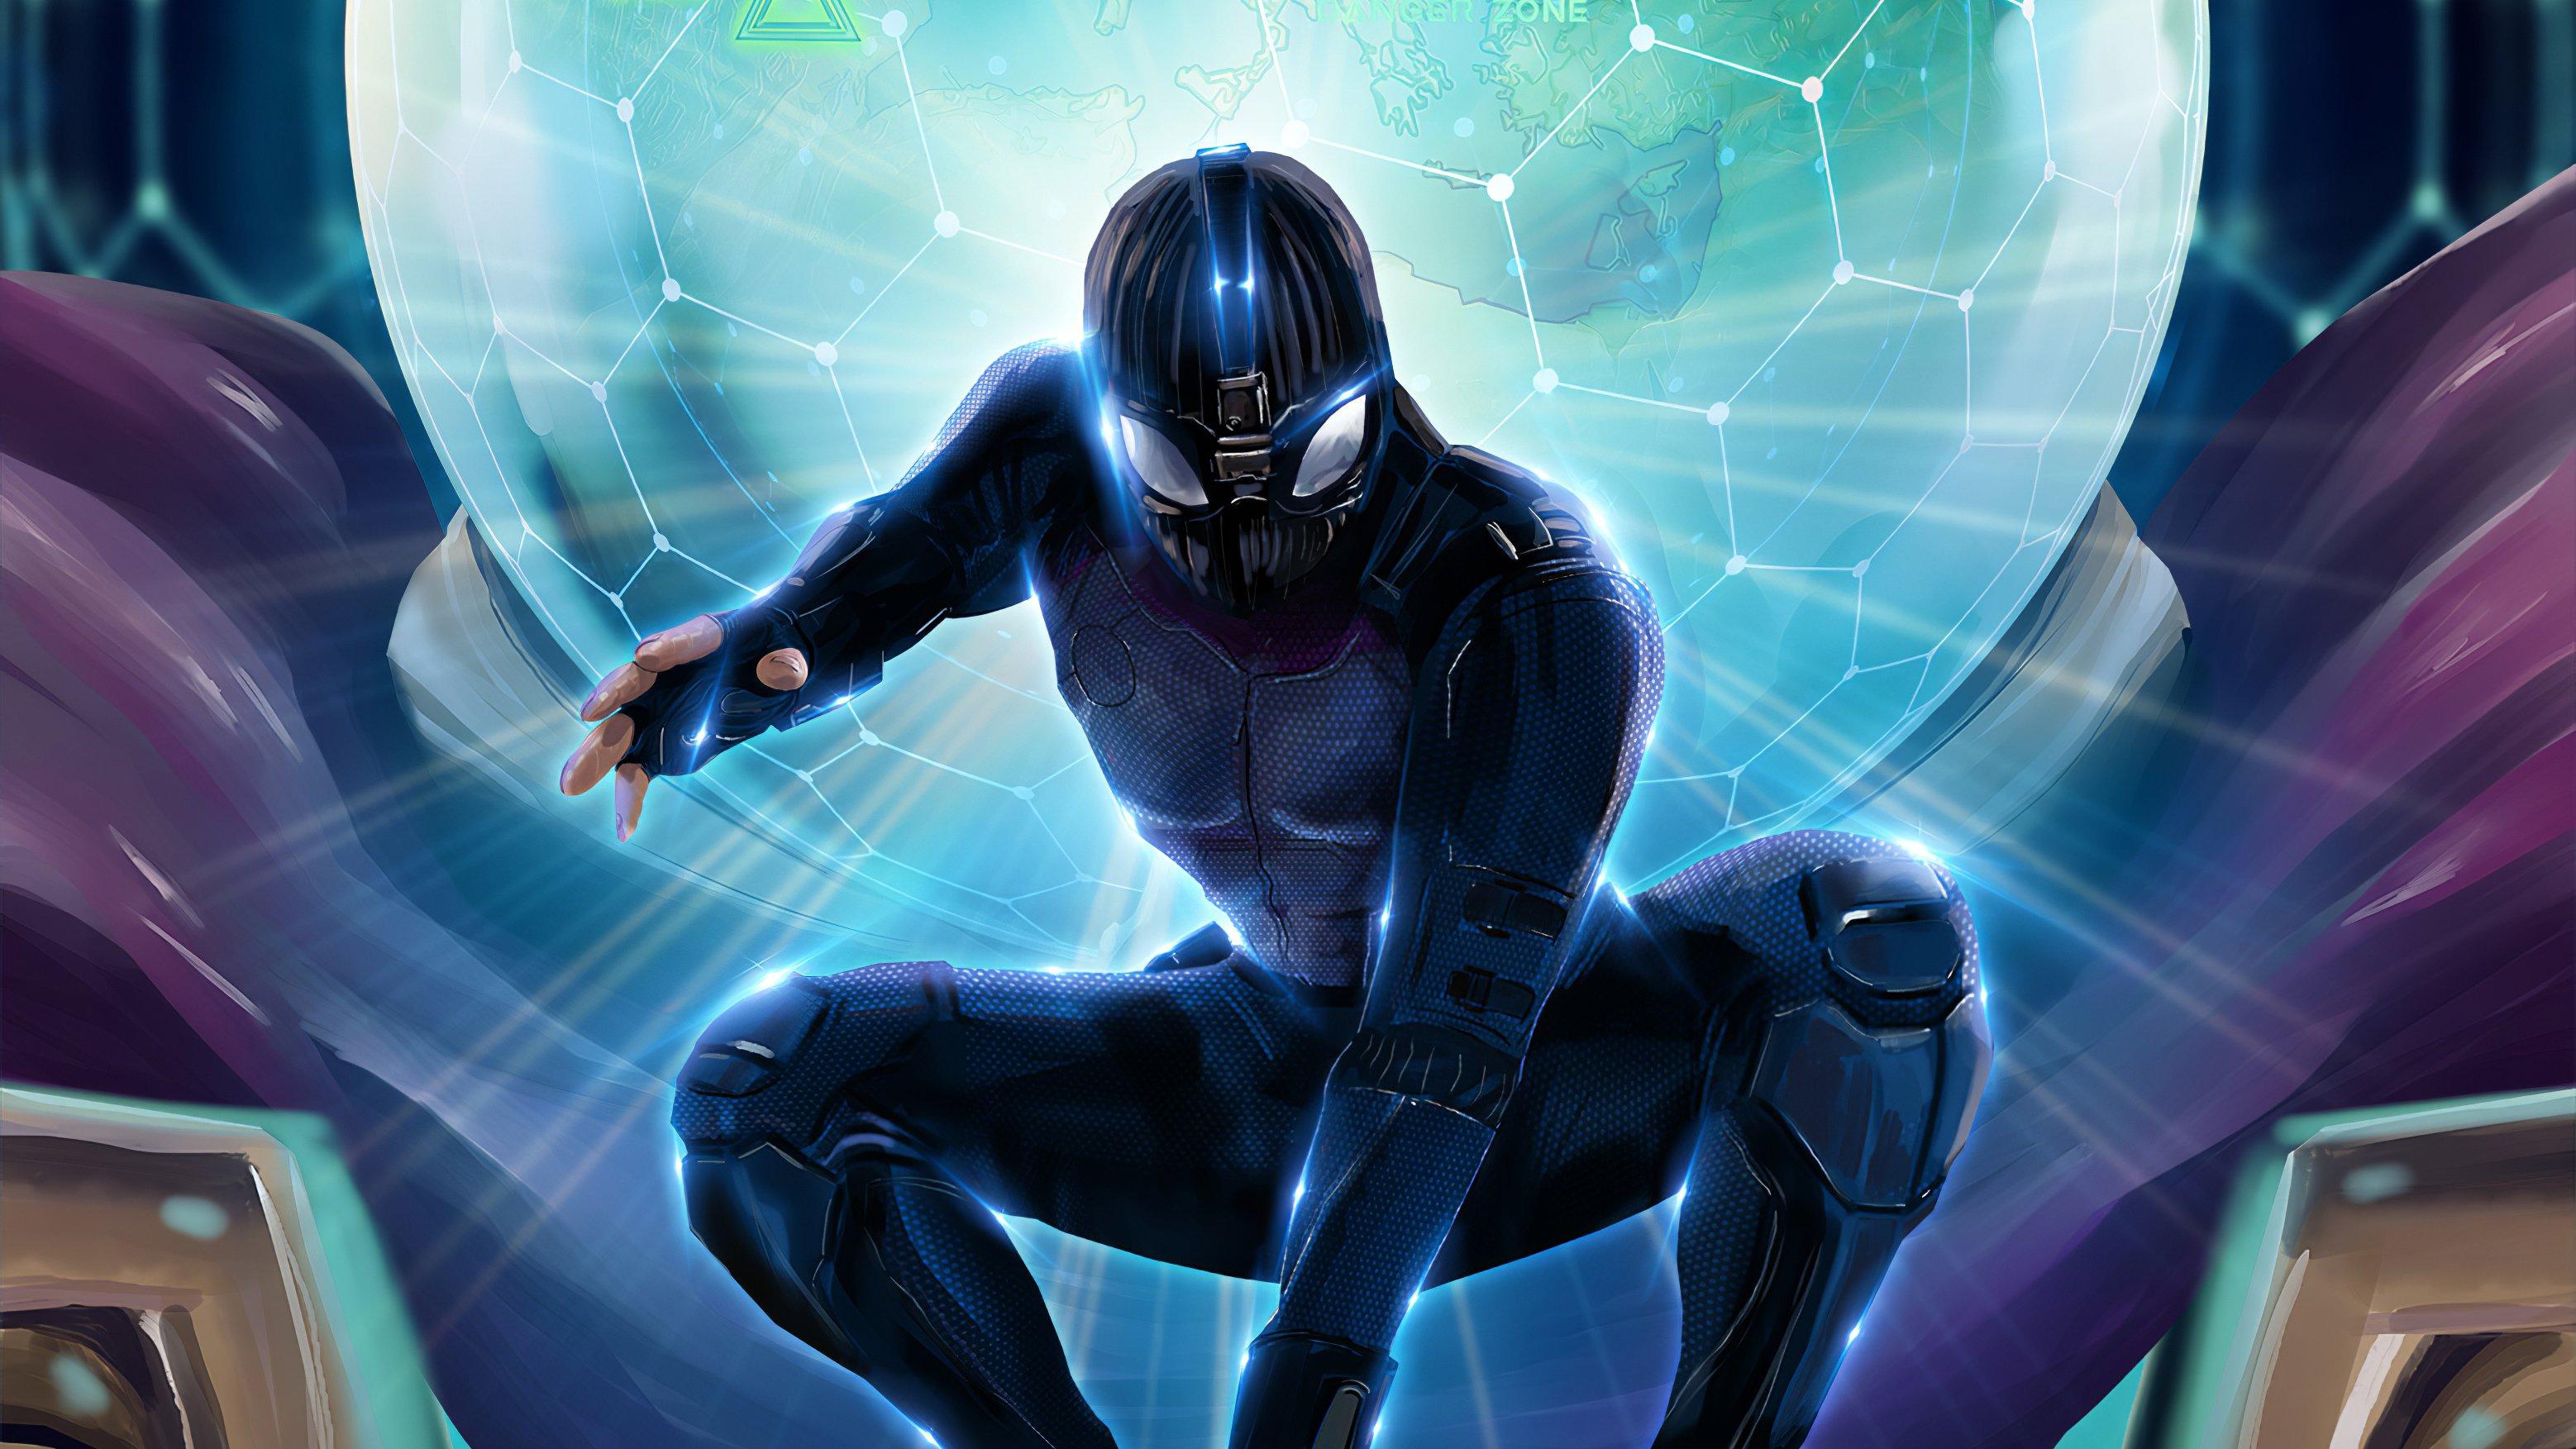 Wallpaper Spiderman Black suit Fanart